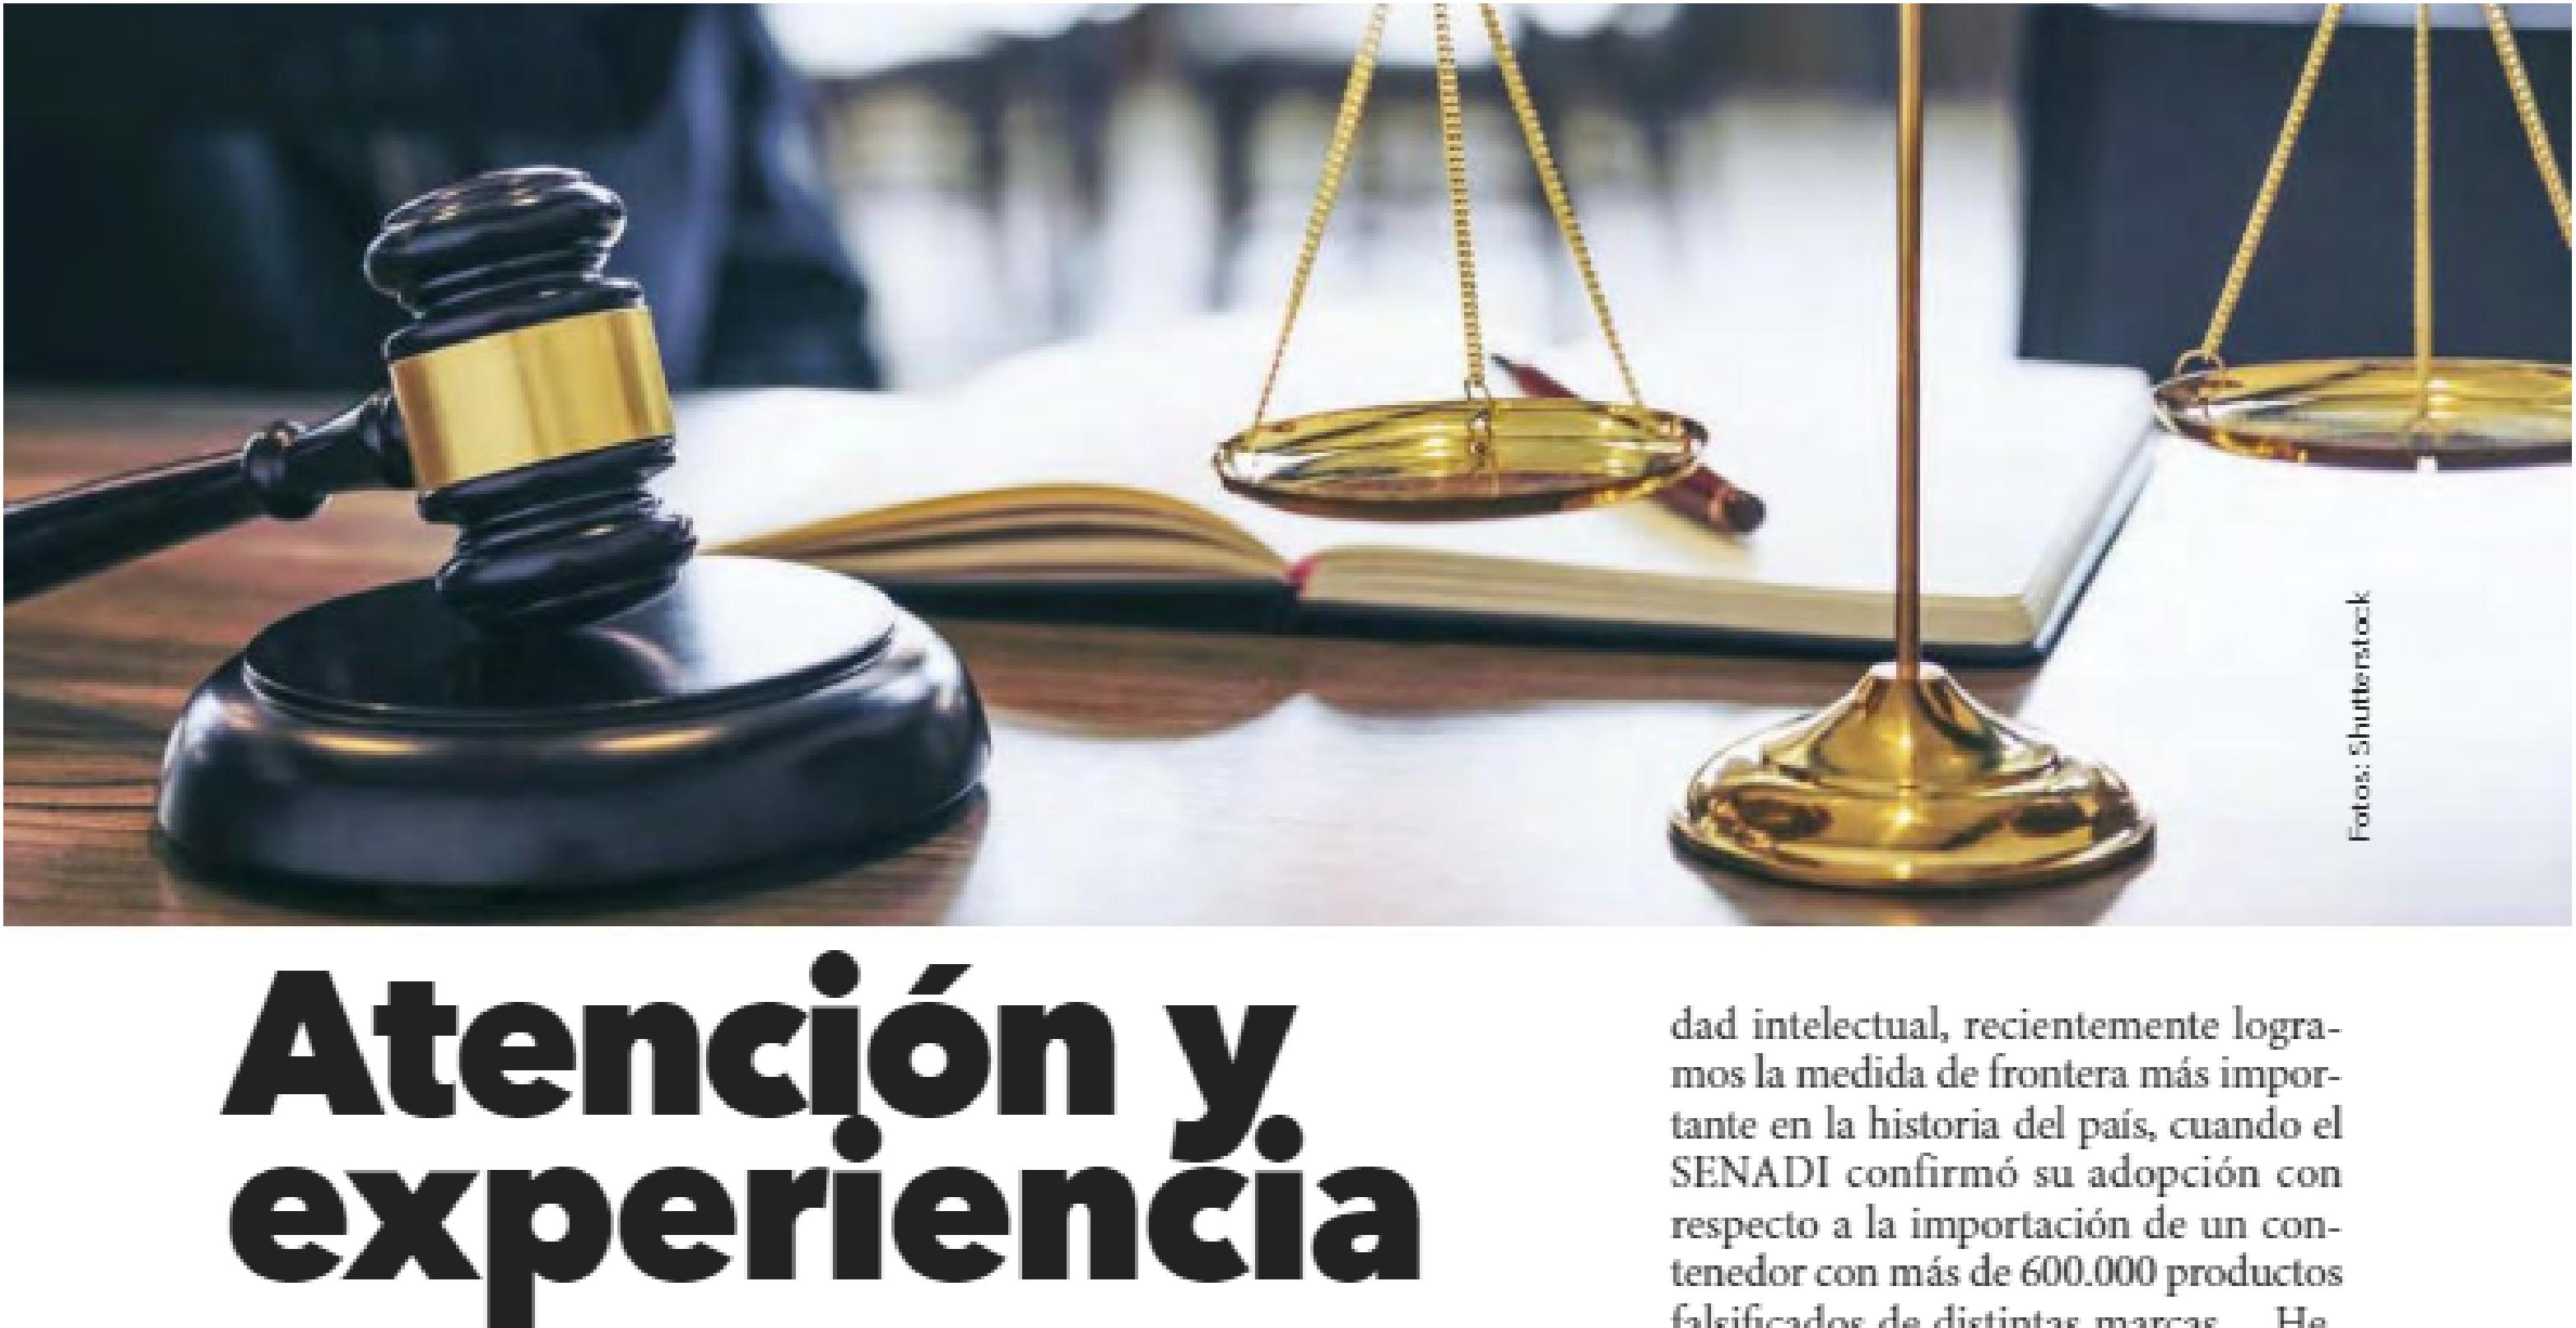 Enfoque - Customer service and experience - Lawyers Ecuador - CorralRosales